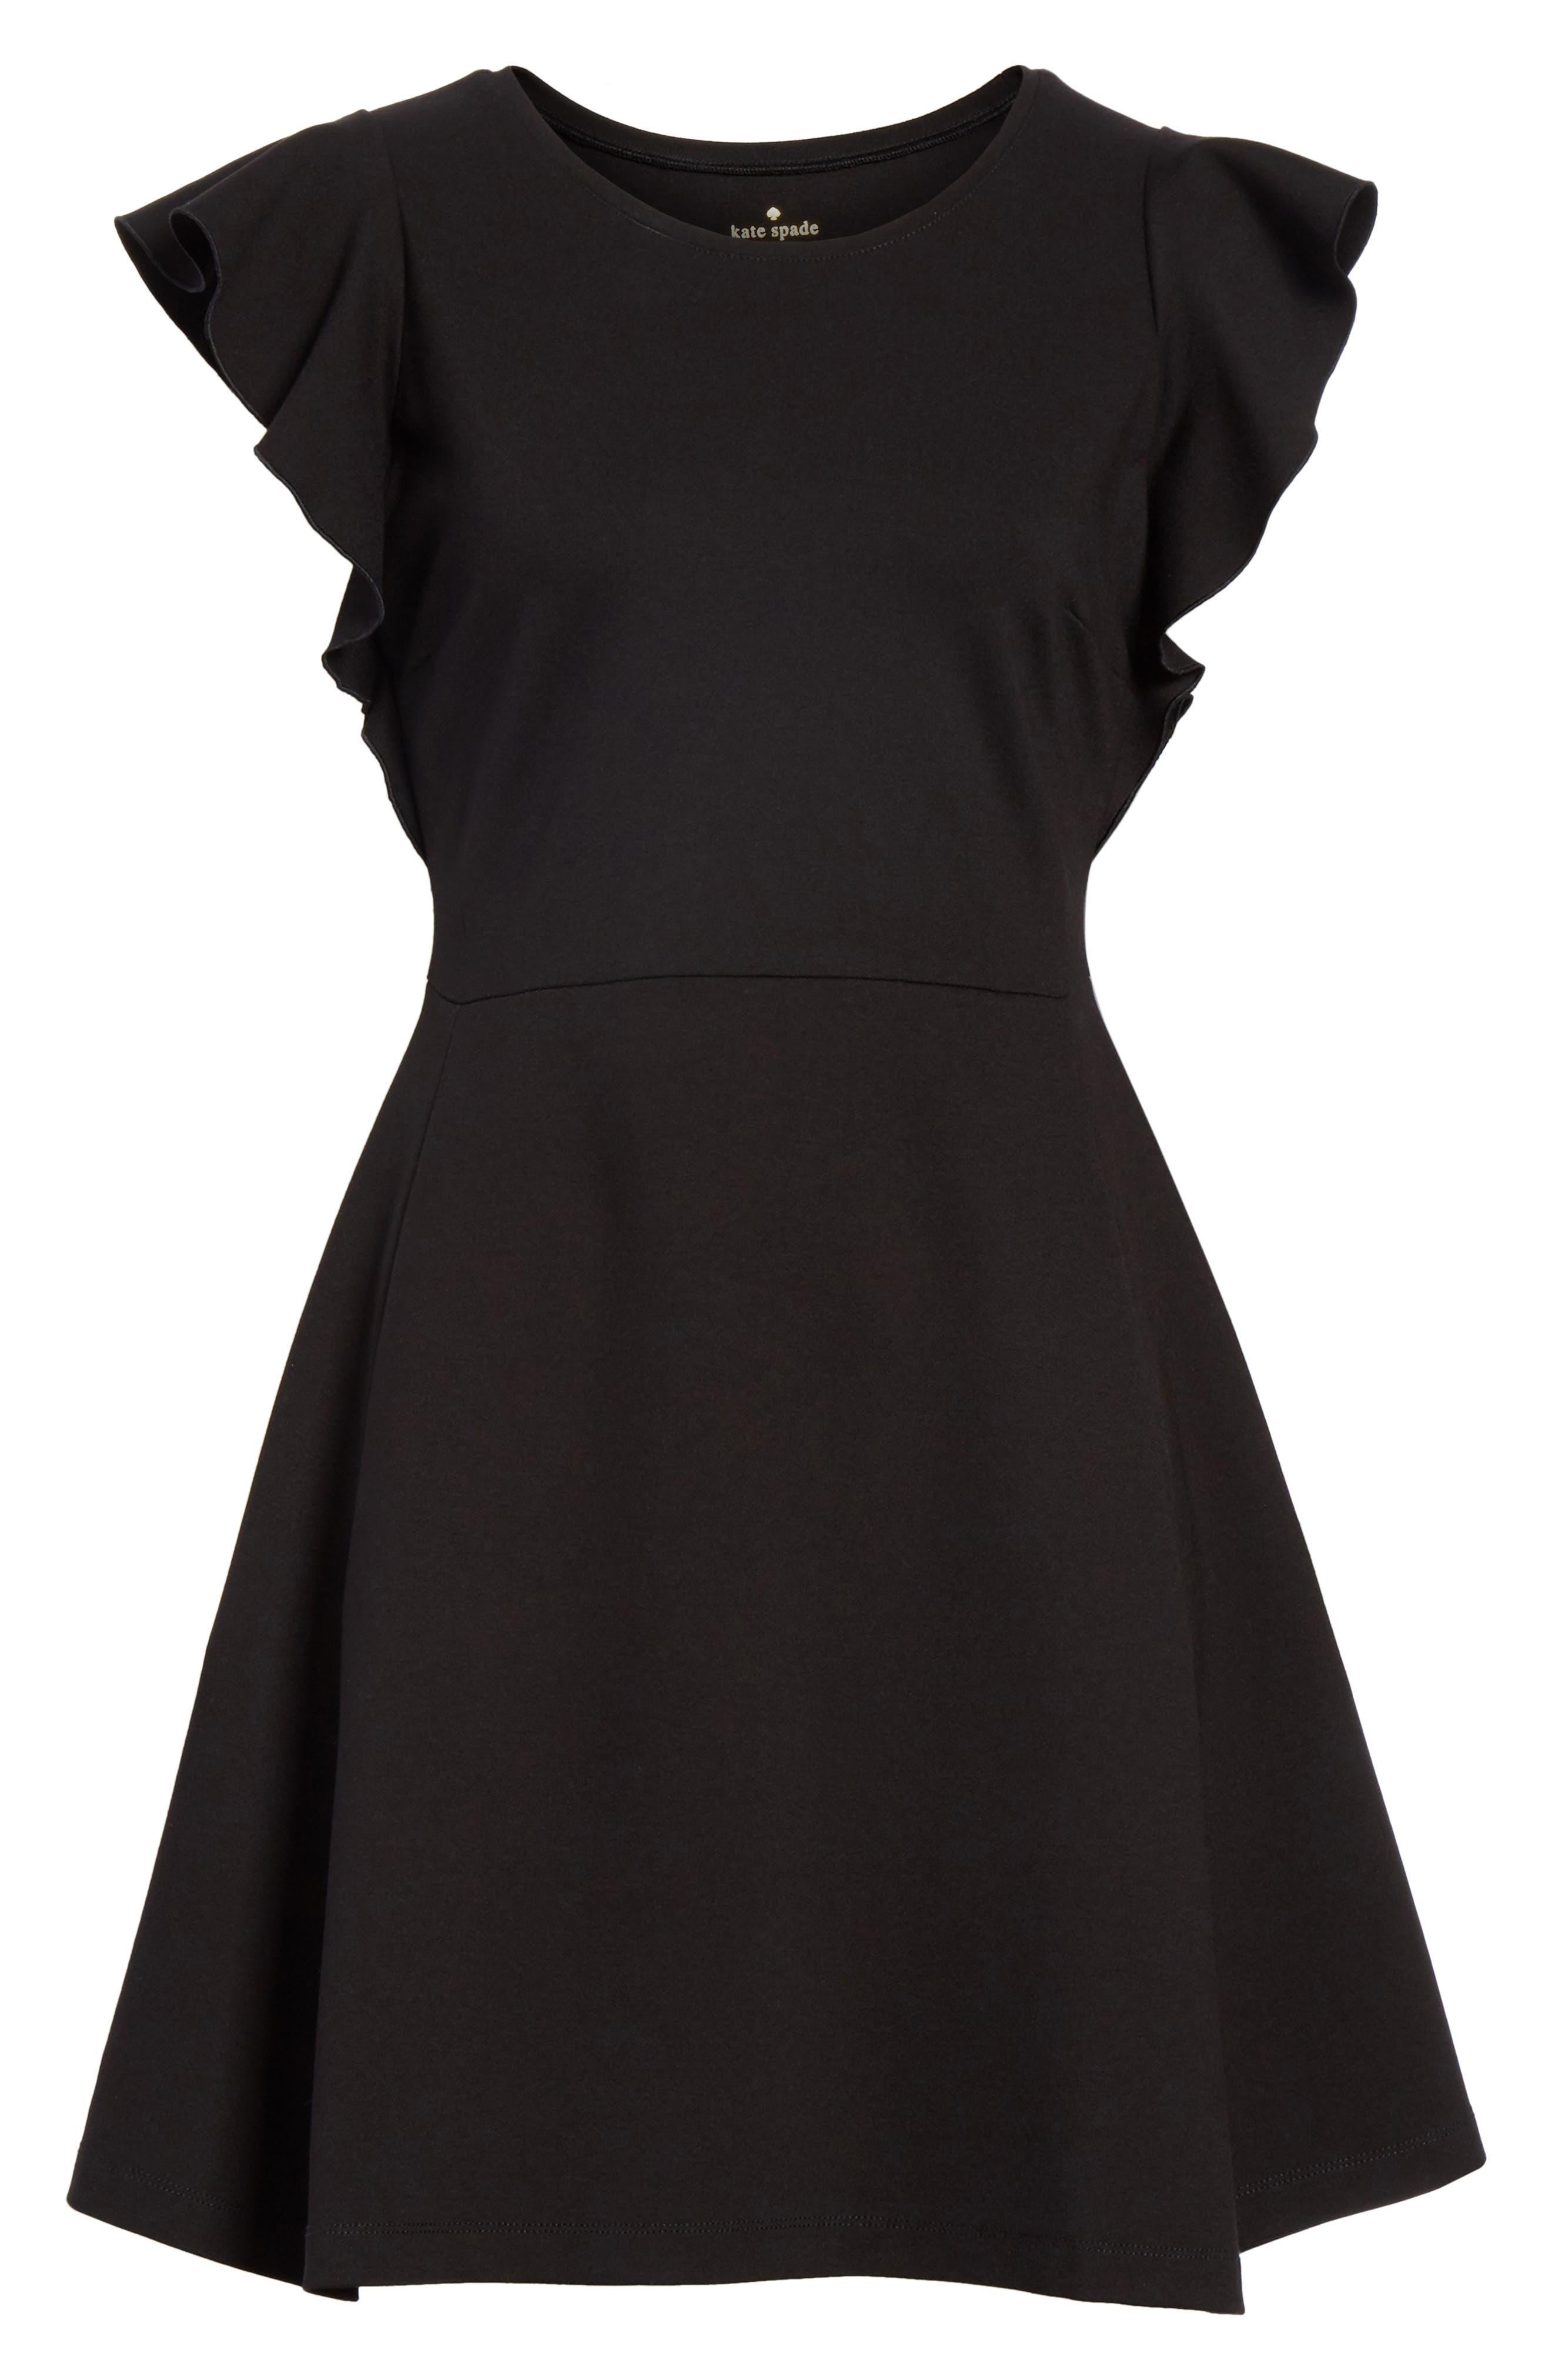 fluttter sleeve ponte knit dress,                             Alternate thumbnail 6, color,                             Black